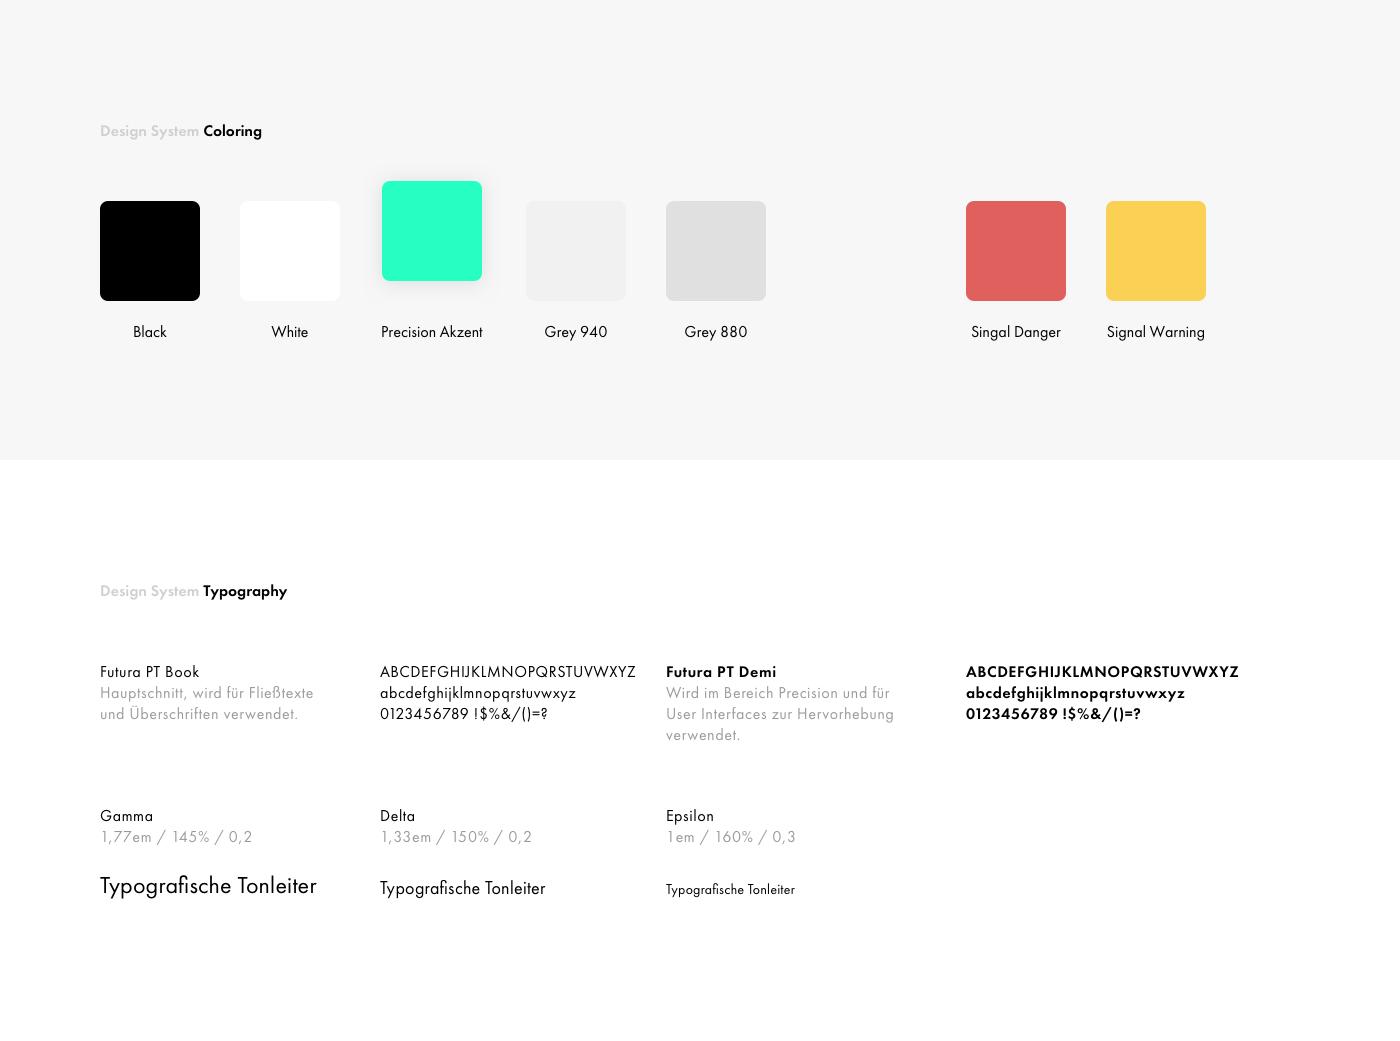 Design System Coloring